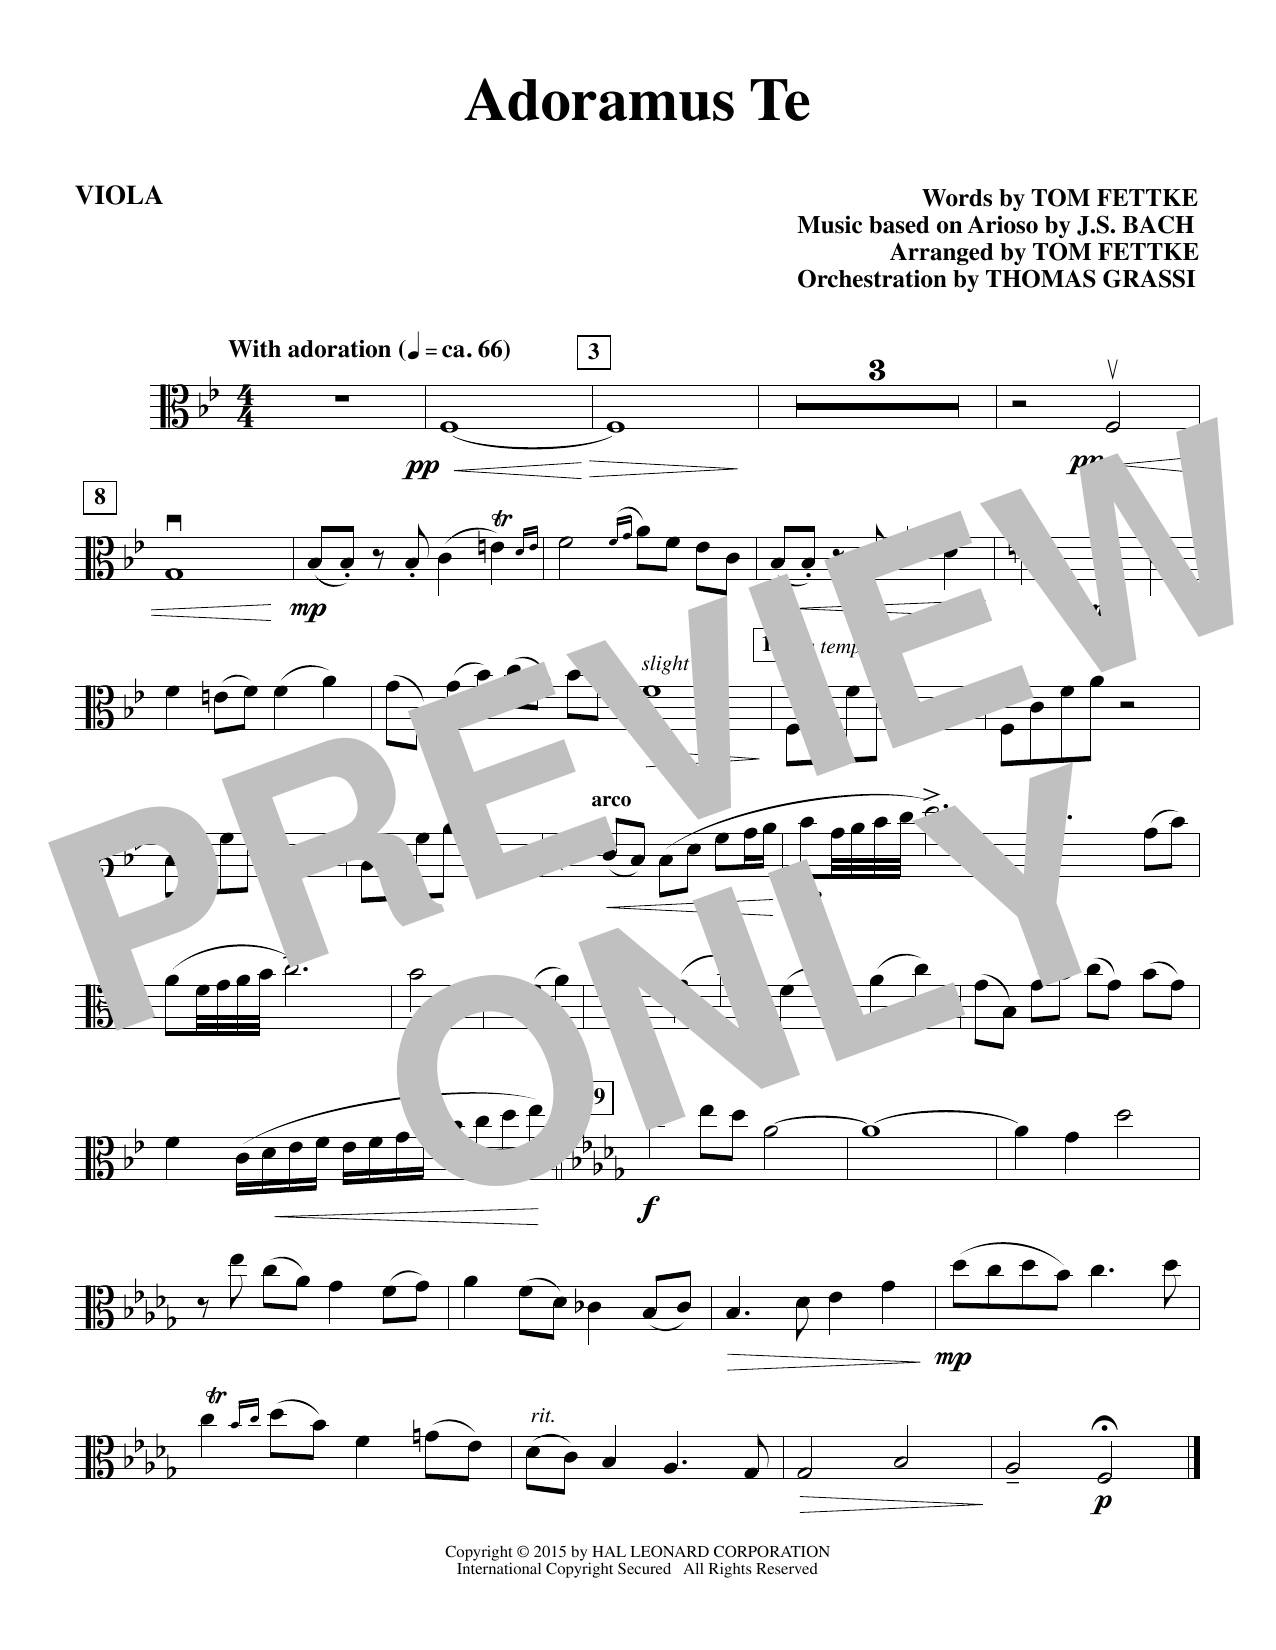 Tom Fettke Adoramus Te - Viola sheet music notes and chords. Download Printable PDF.